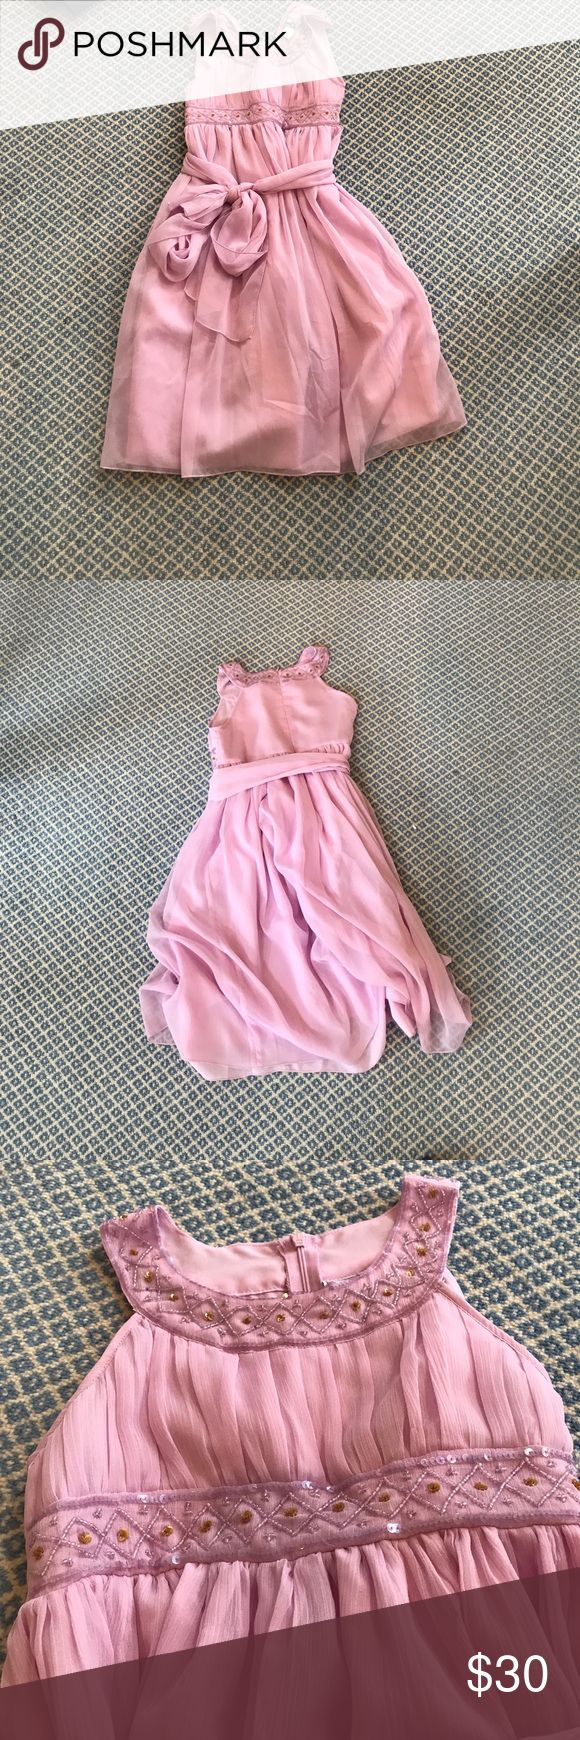 Cotton Kids Light Pink/Lavender Kids Dress. Size 10 Cotton Kids purple dress with smalls sparkles and gems. In fantastic condition. Cotton Kids Dresses Formal